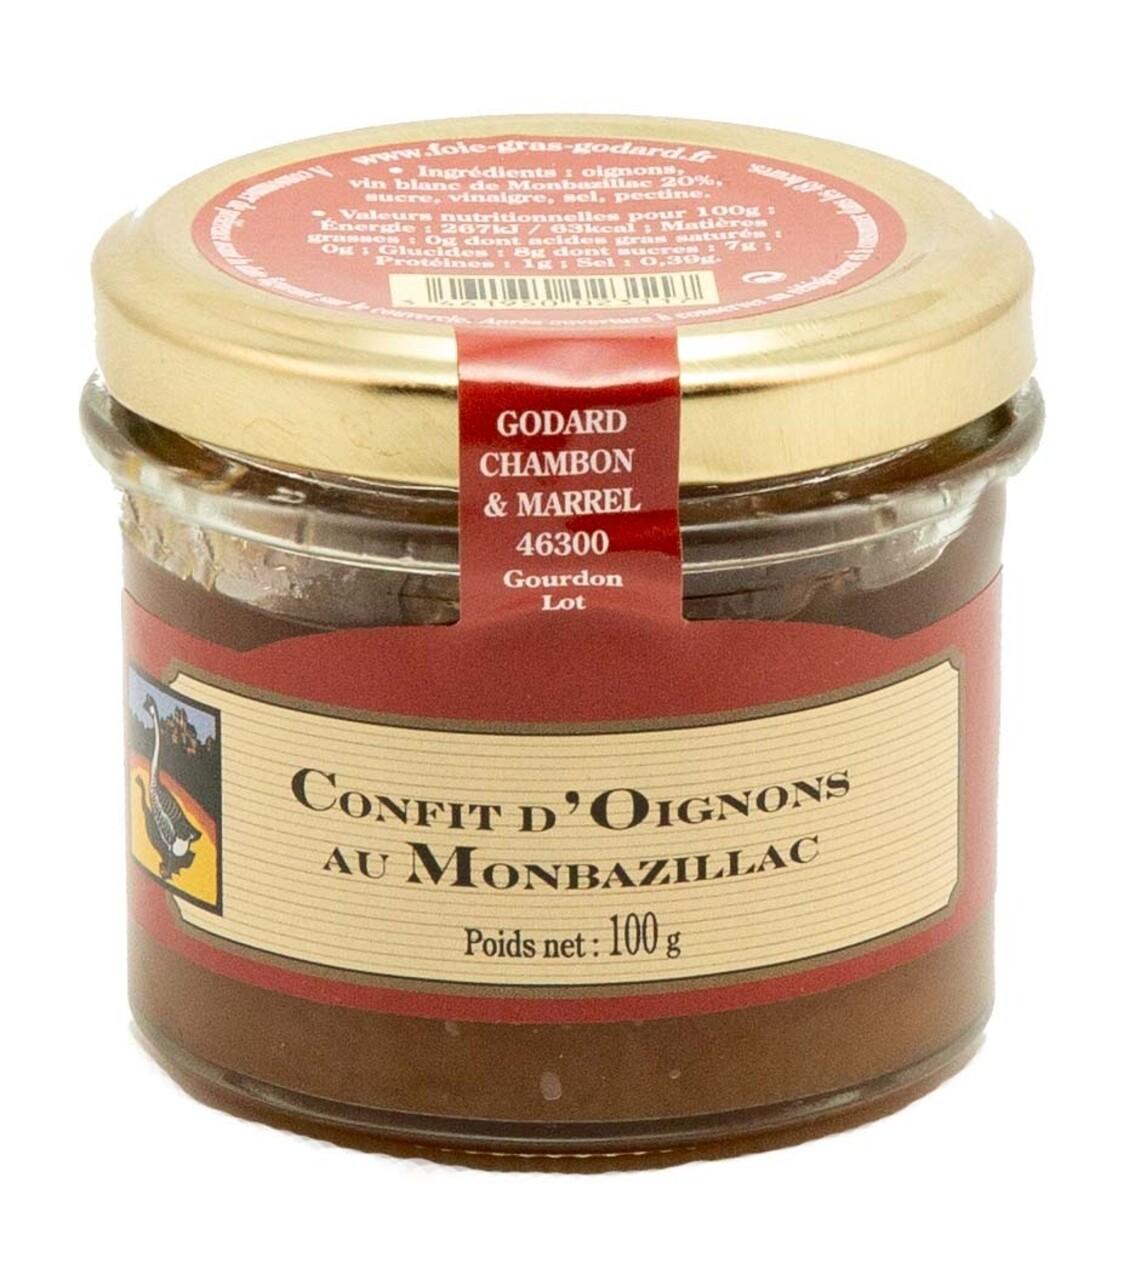 Confit de ceapa cu Monbazillac, Godard Chambon & Marell, Franta 100g